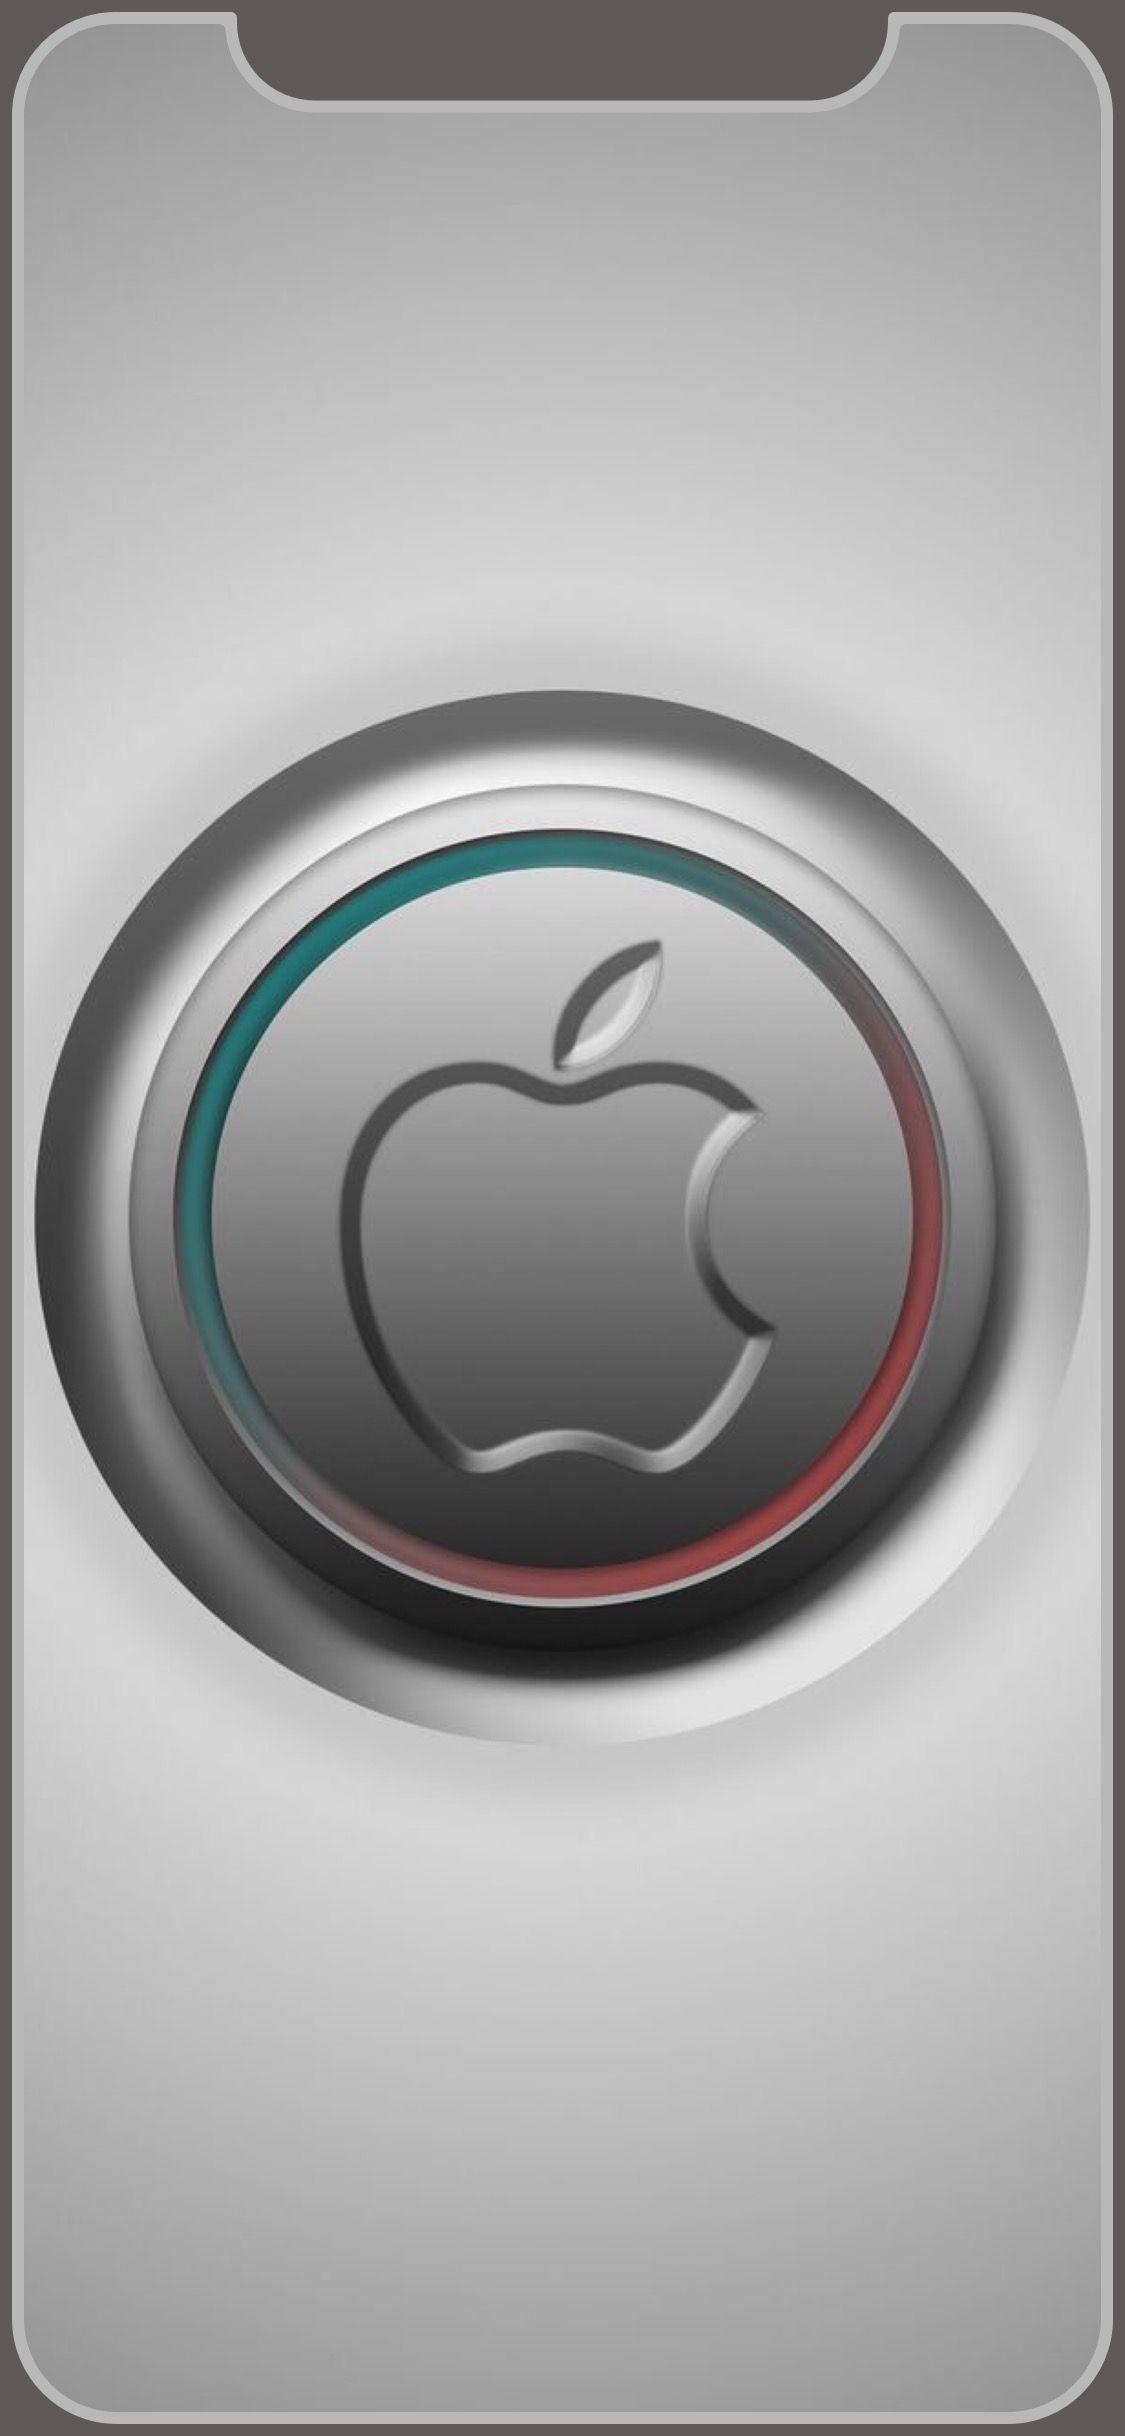 Unduh 100 Wallpaper Apple God  Terbaik